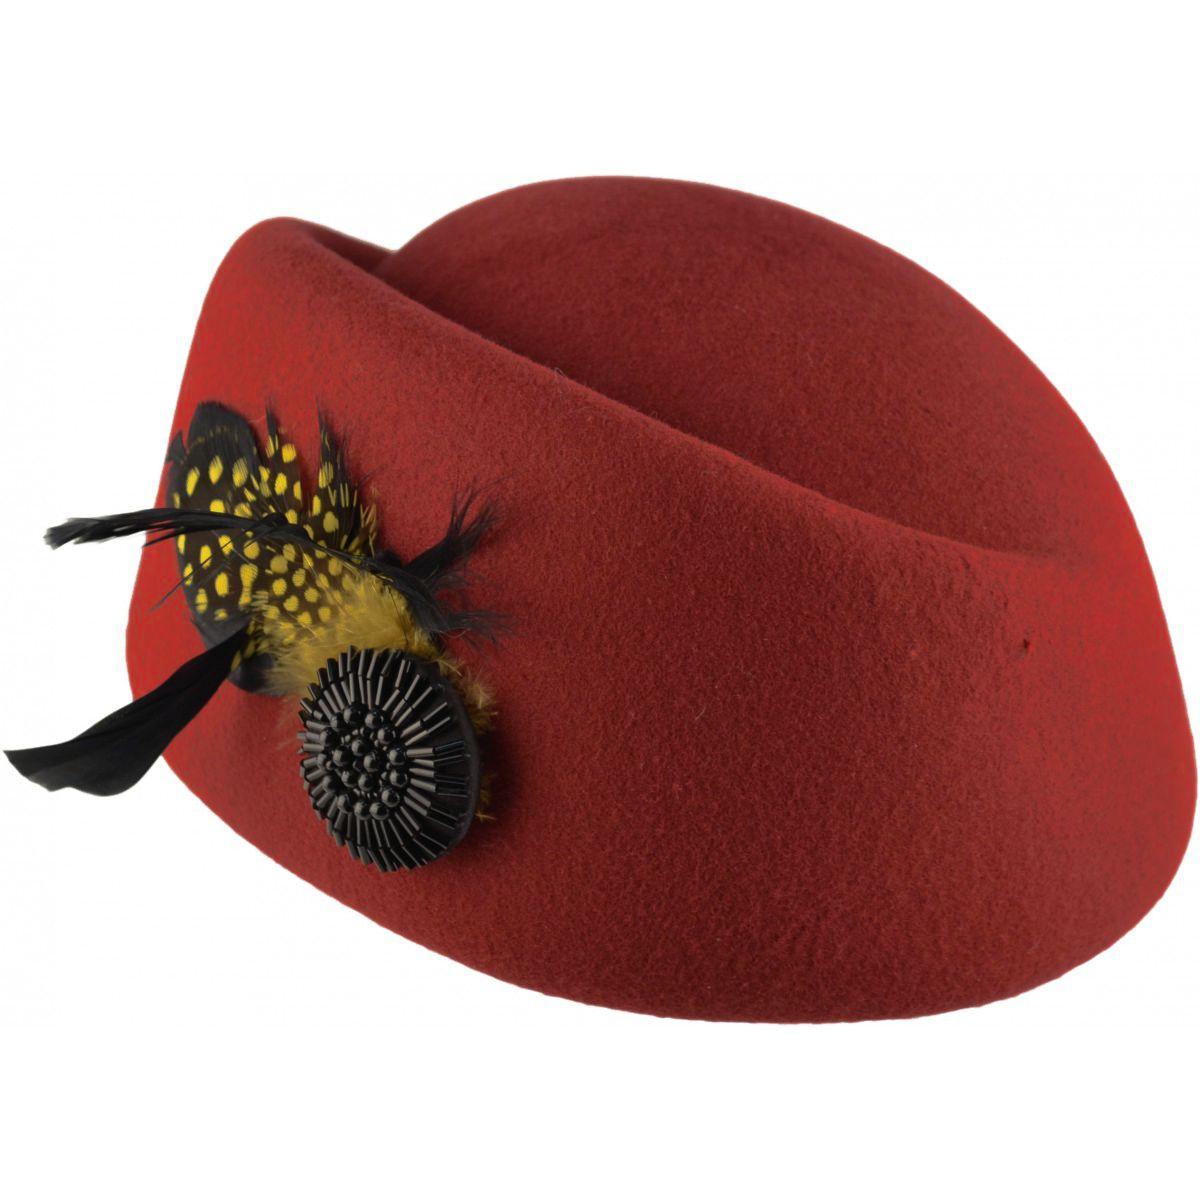 eae2533r_chapeau-retro-pin-up-40-s-50-s-glam-chic-anna-bordeaux